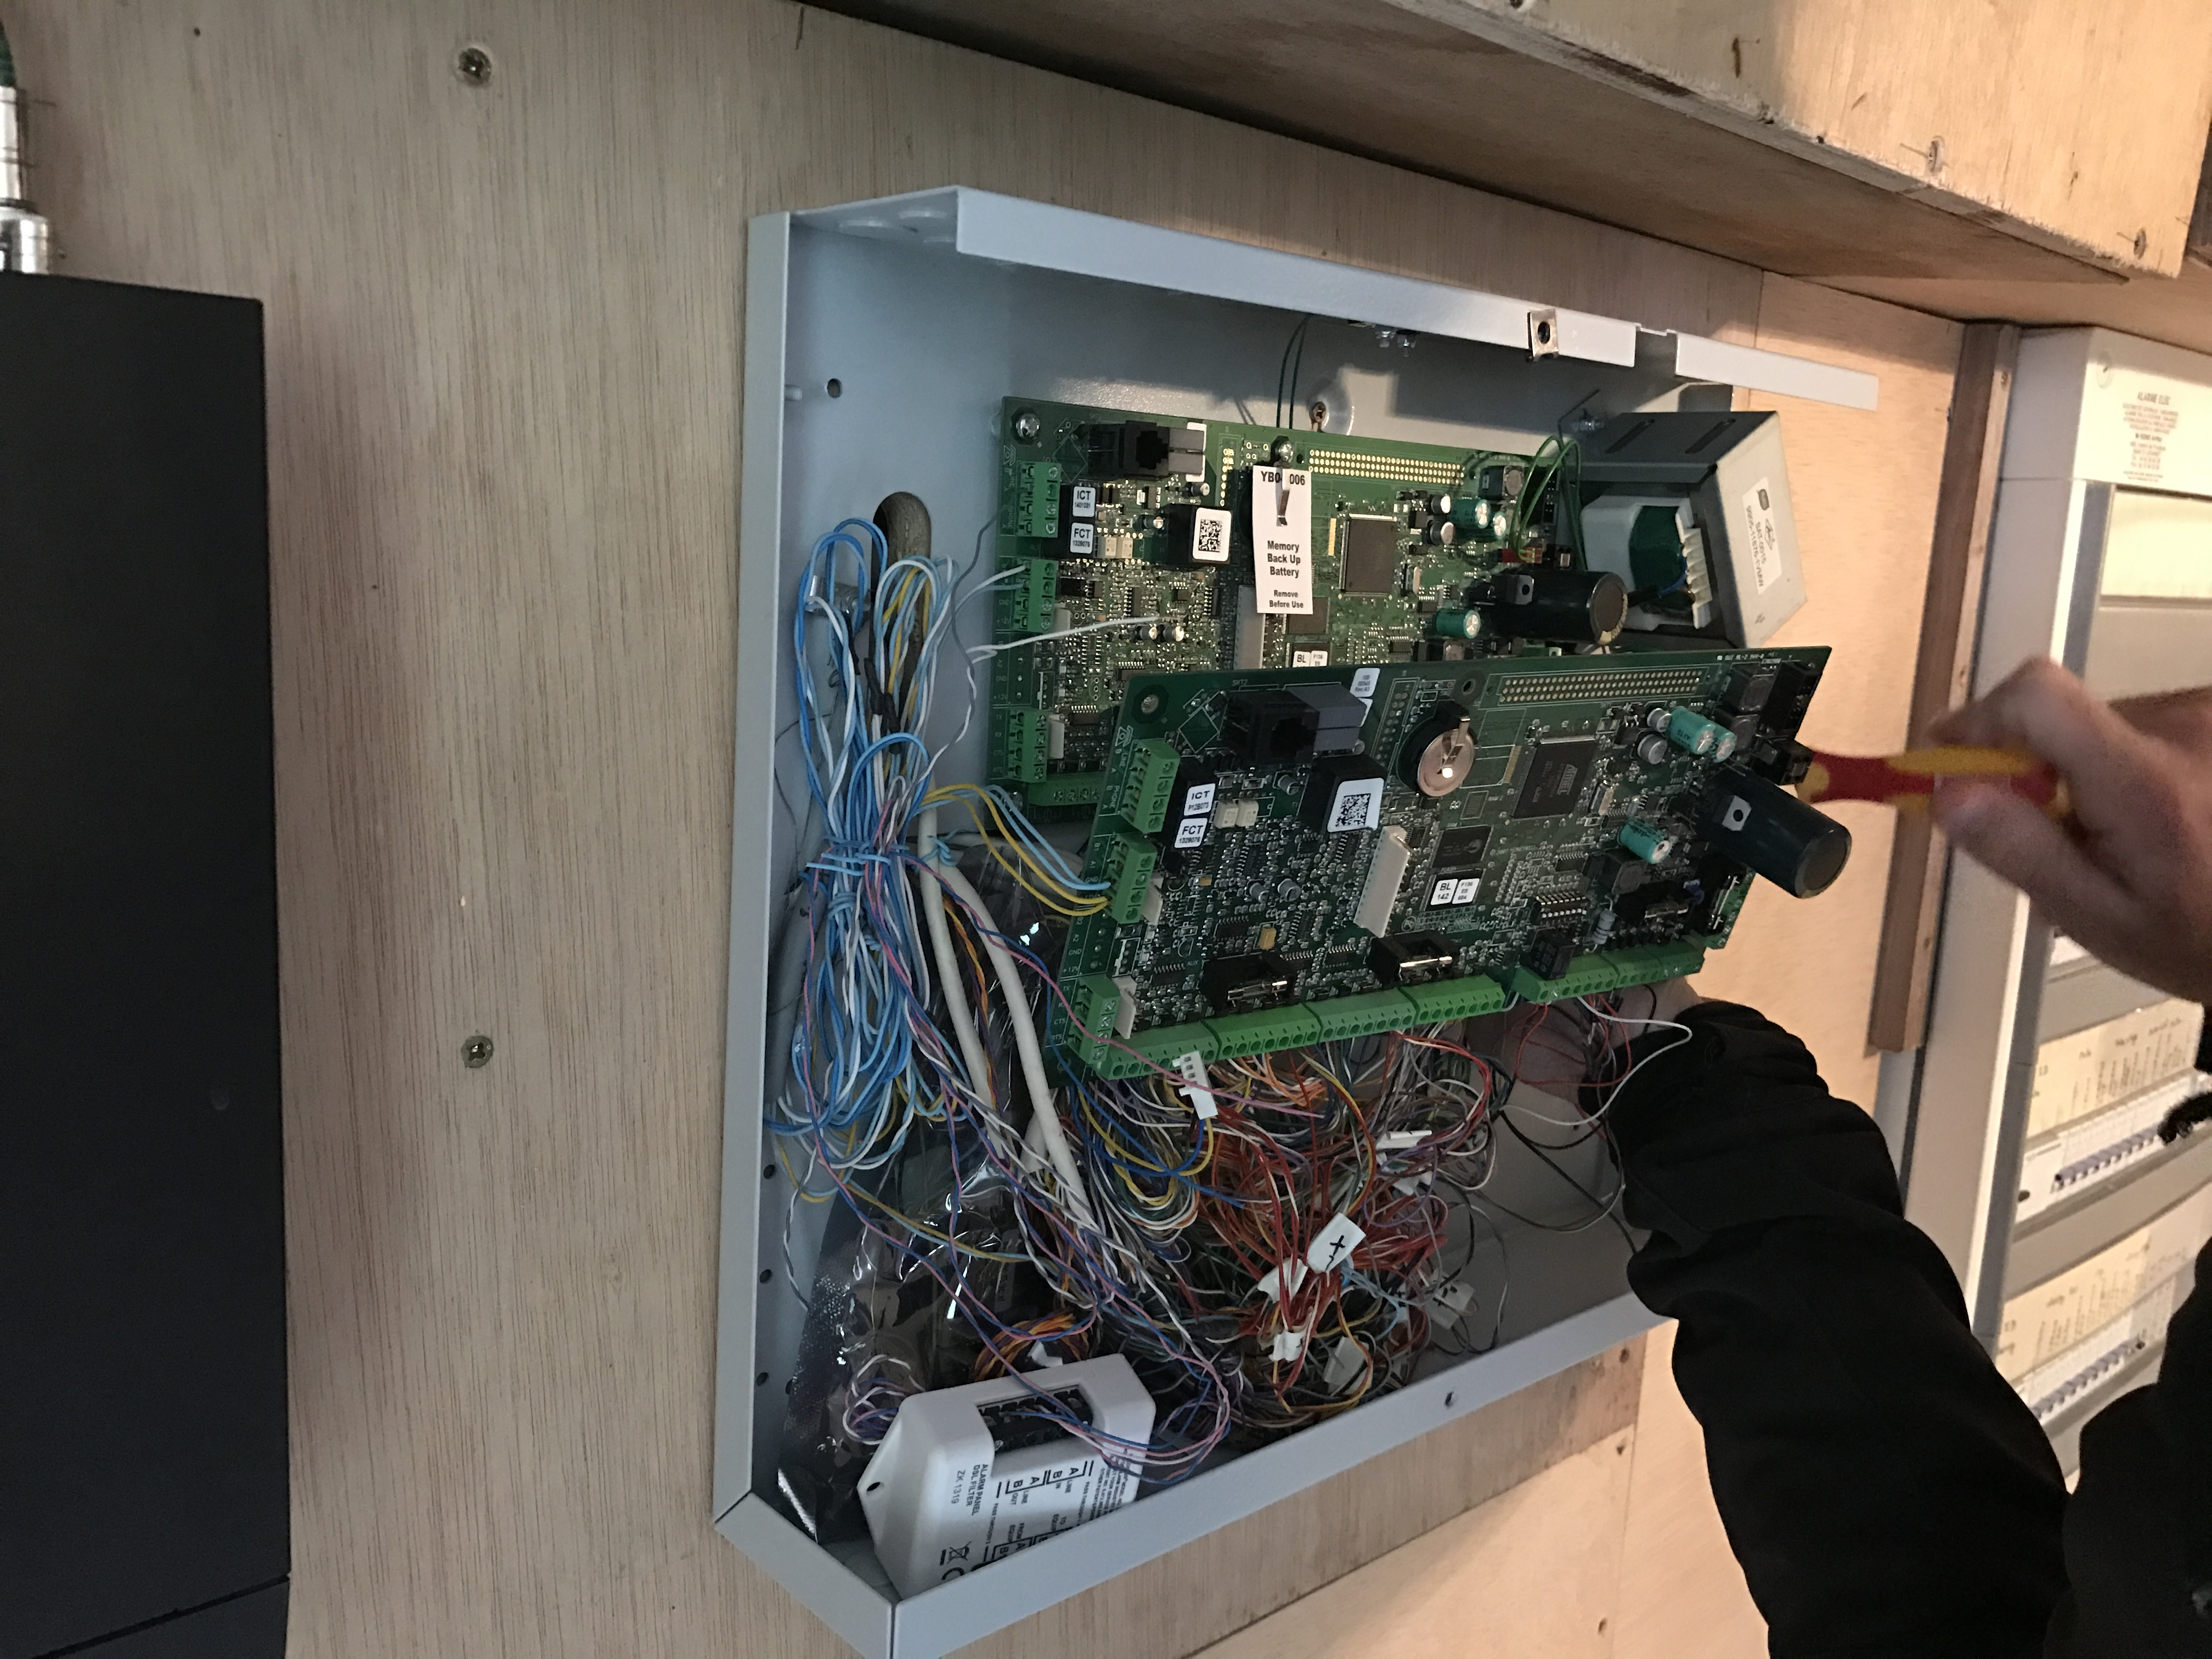 Installation alarme grasse 06